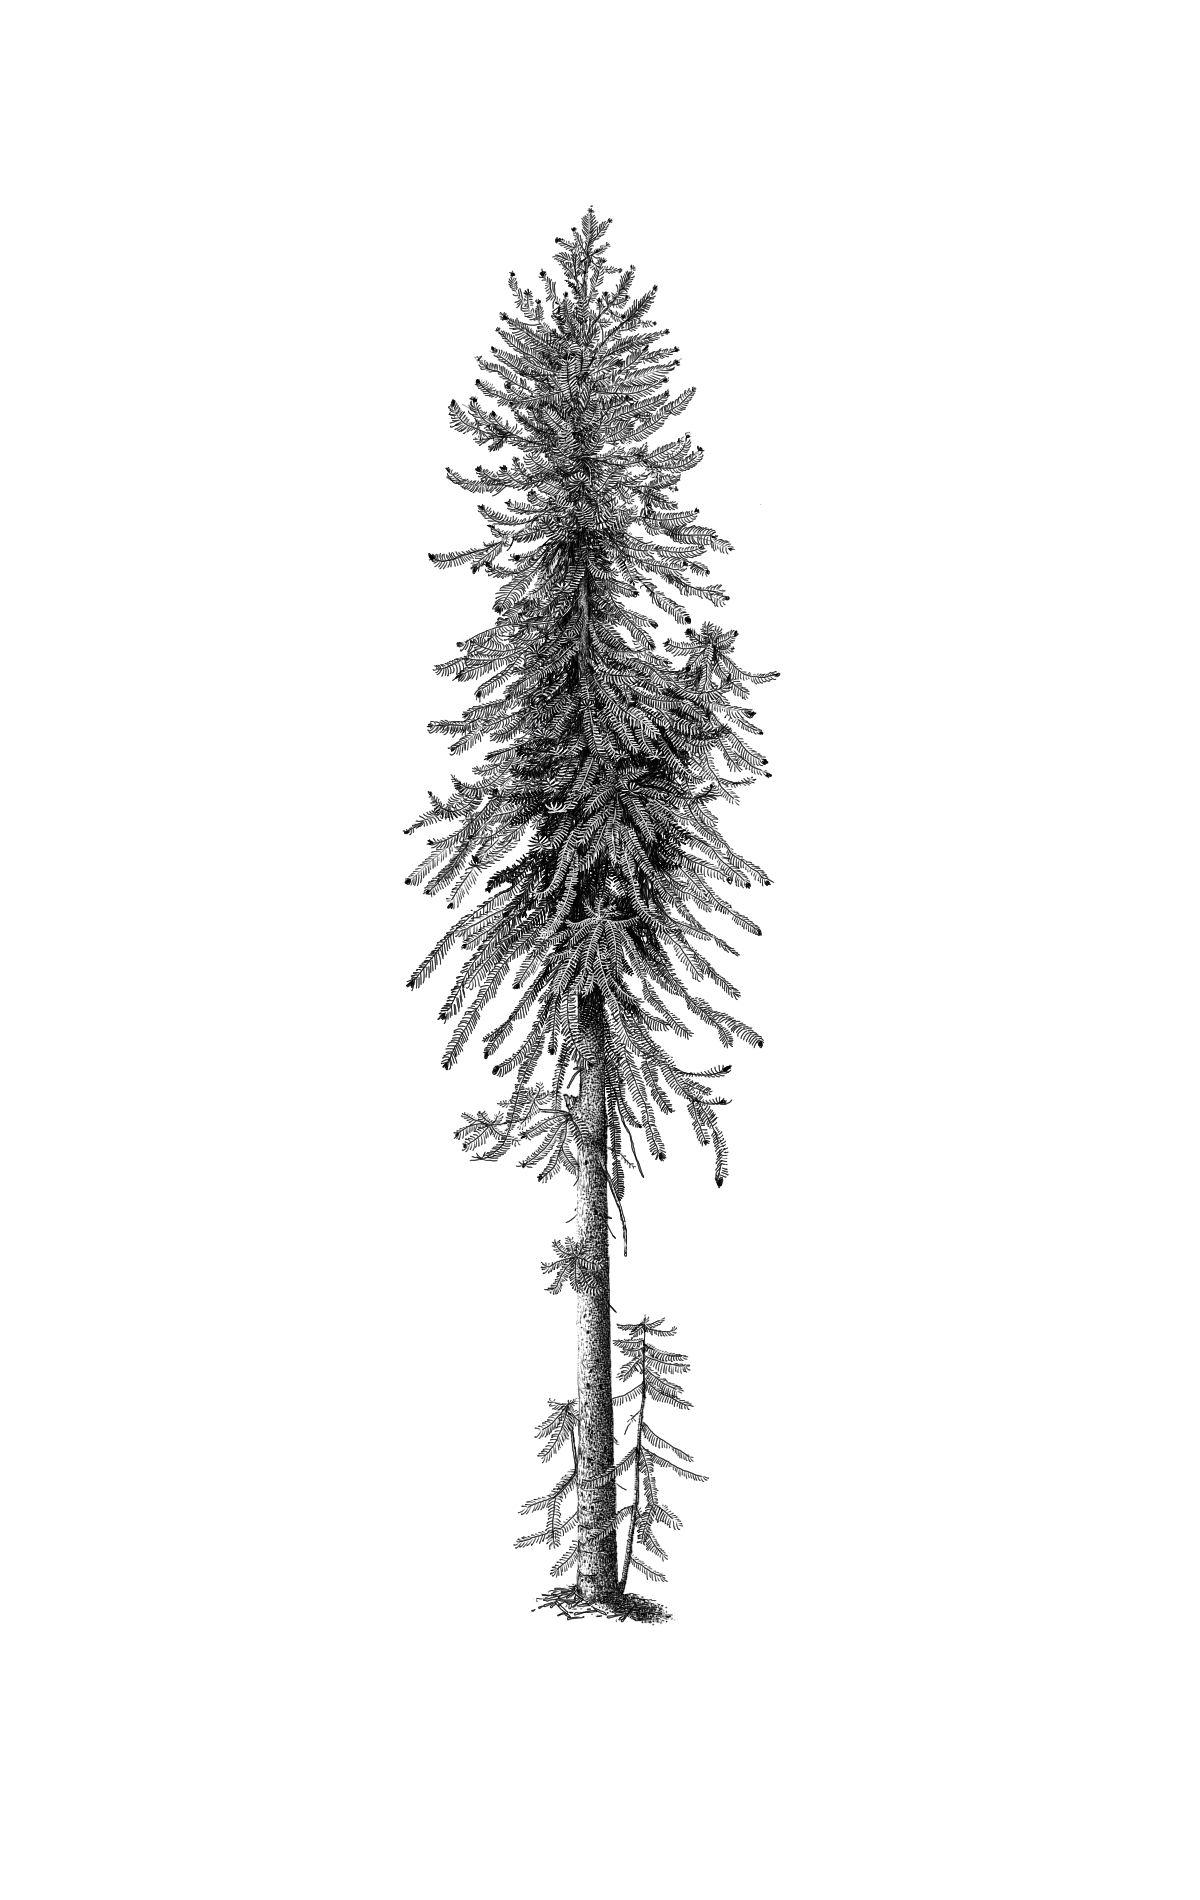 wollemi pine9.jpg